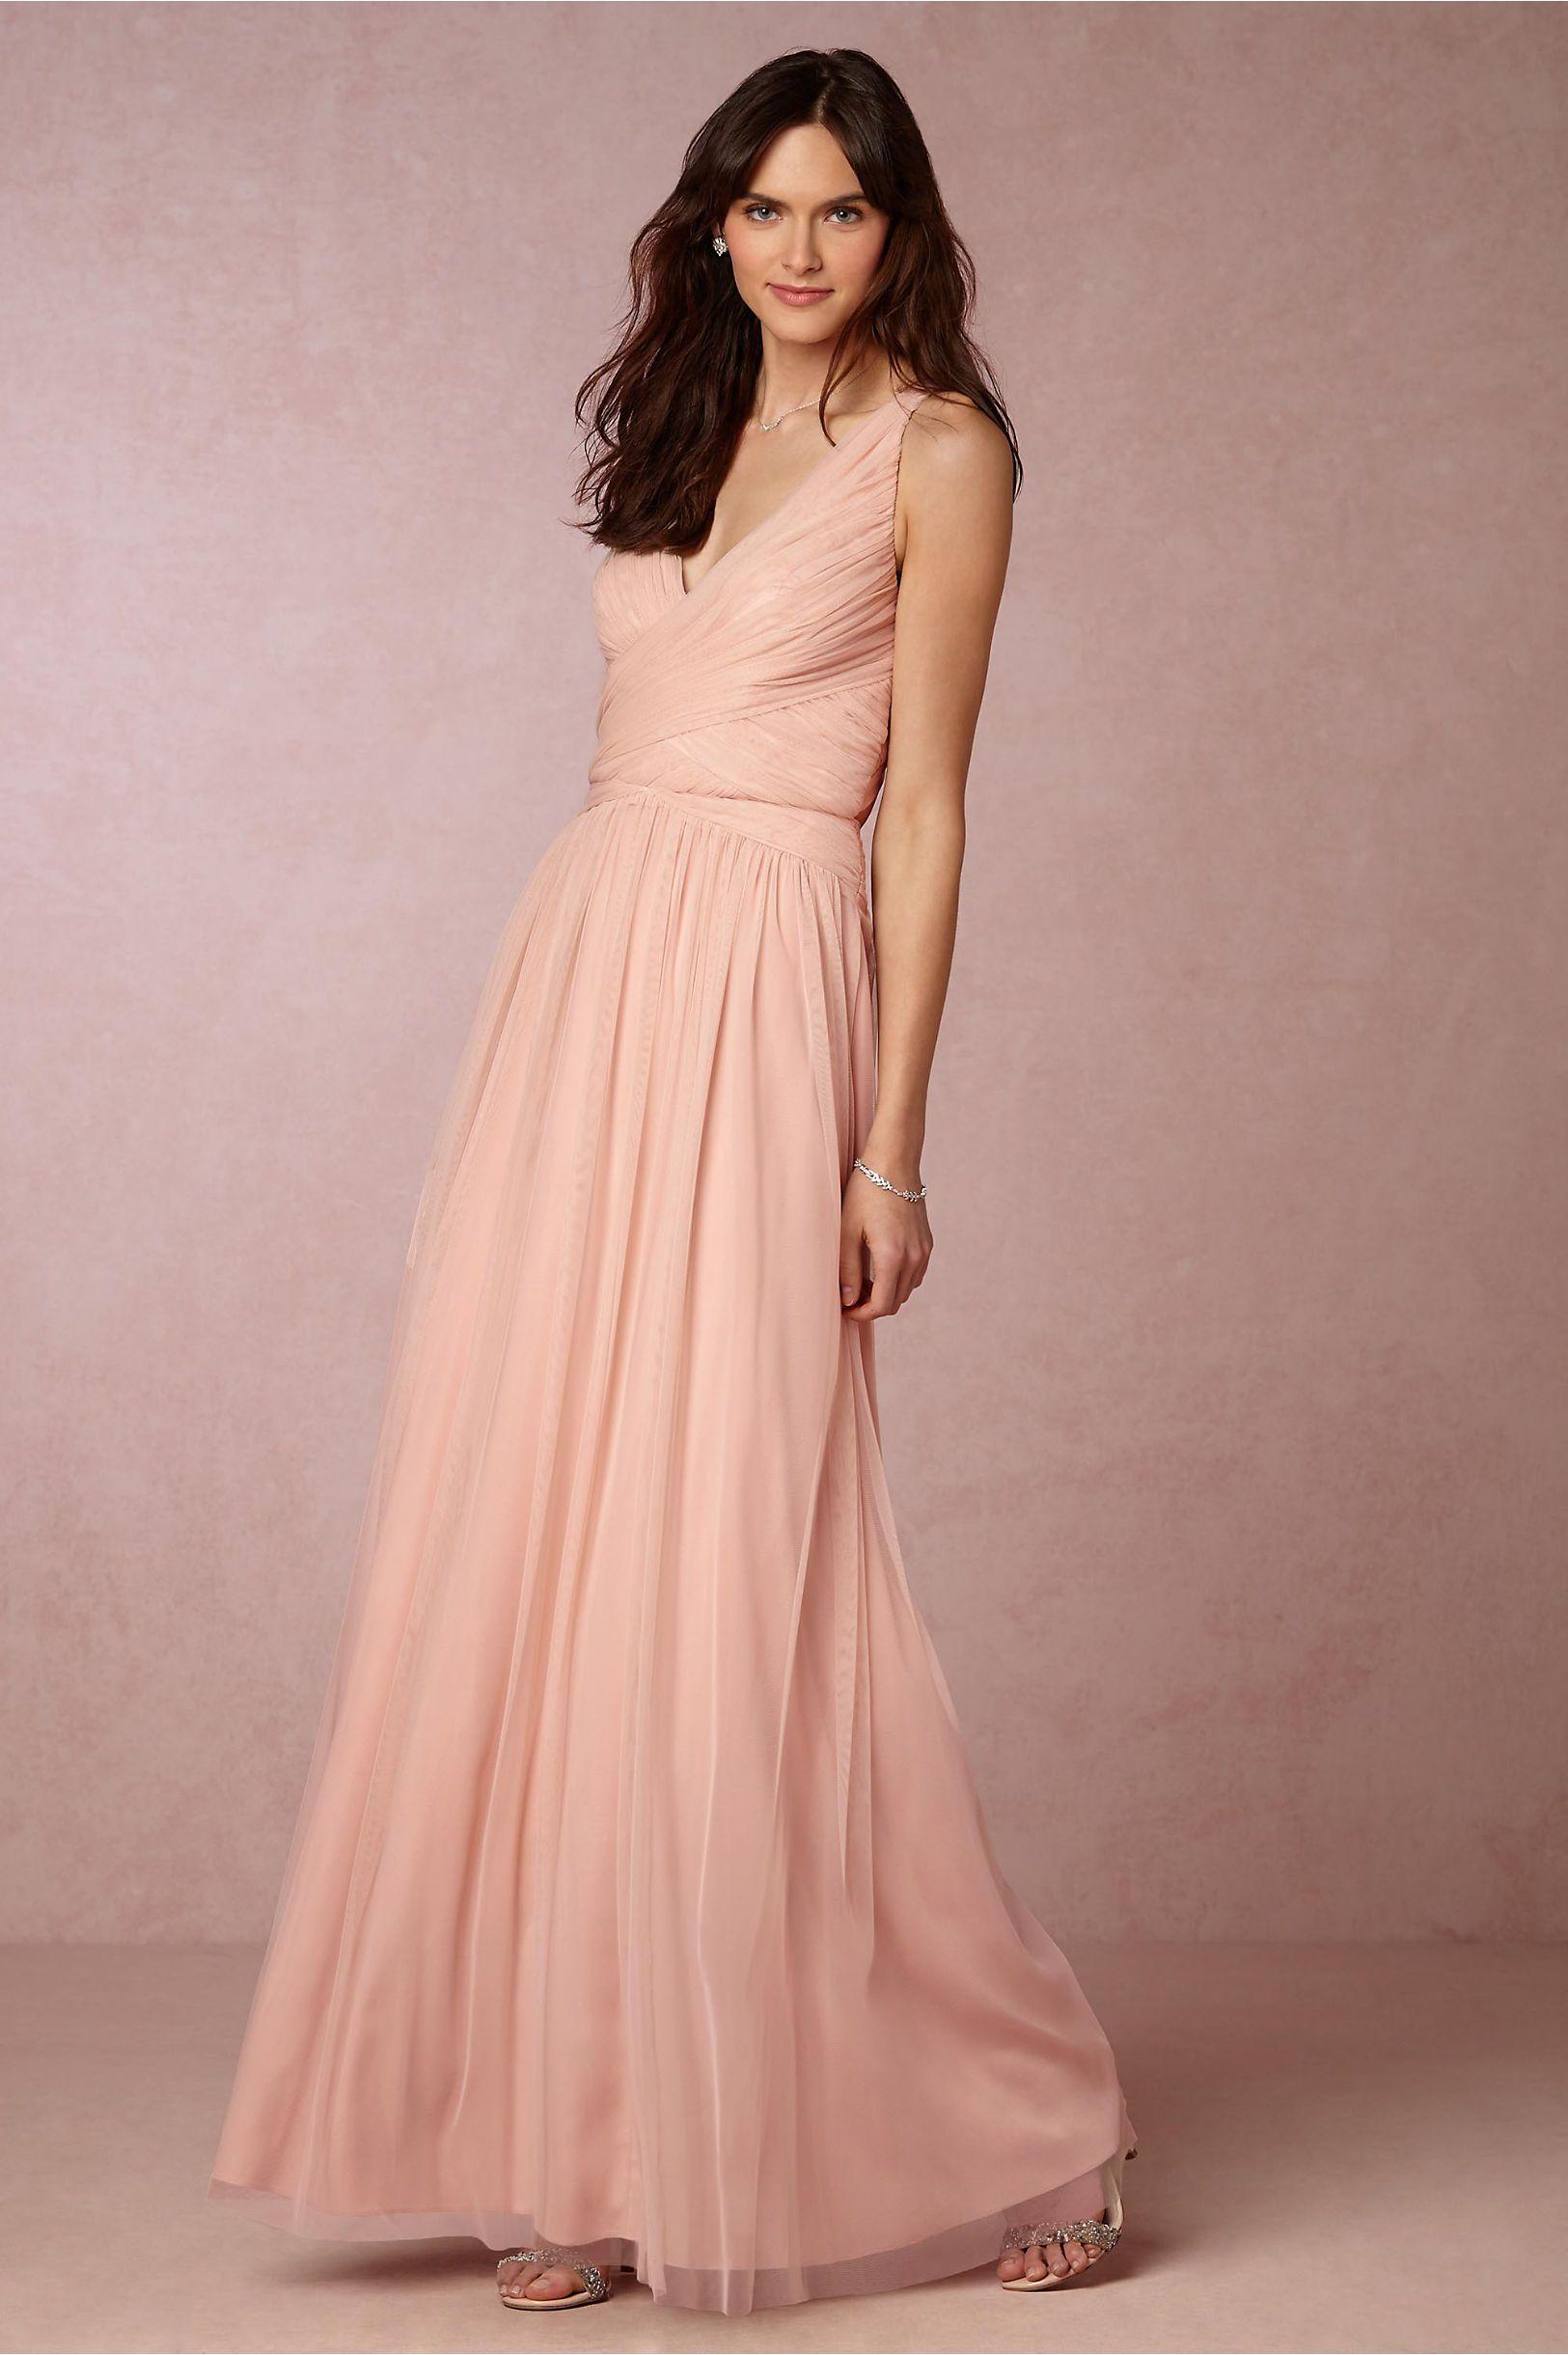 Saras dress taupe pink bhldn bridesmaids pinterest bridesmaid saras dress taupe ombrellifo Gallery